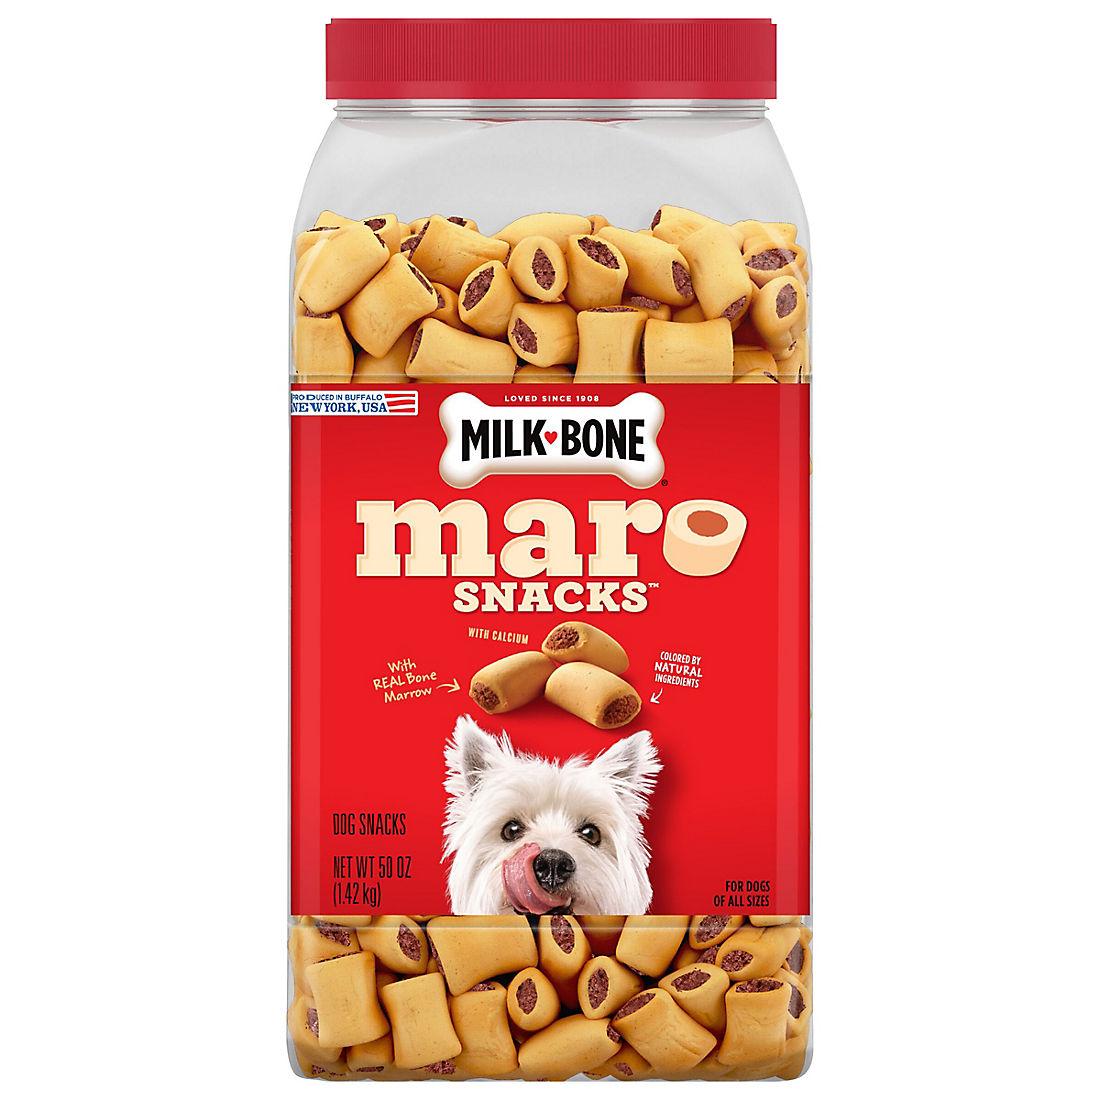 Milk Bone Marosnacks Small Dog Snacks